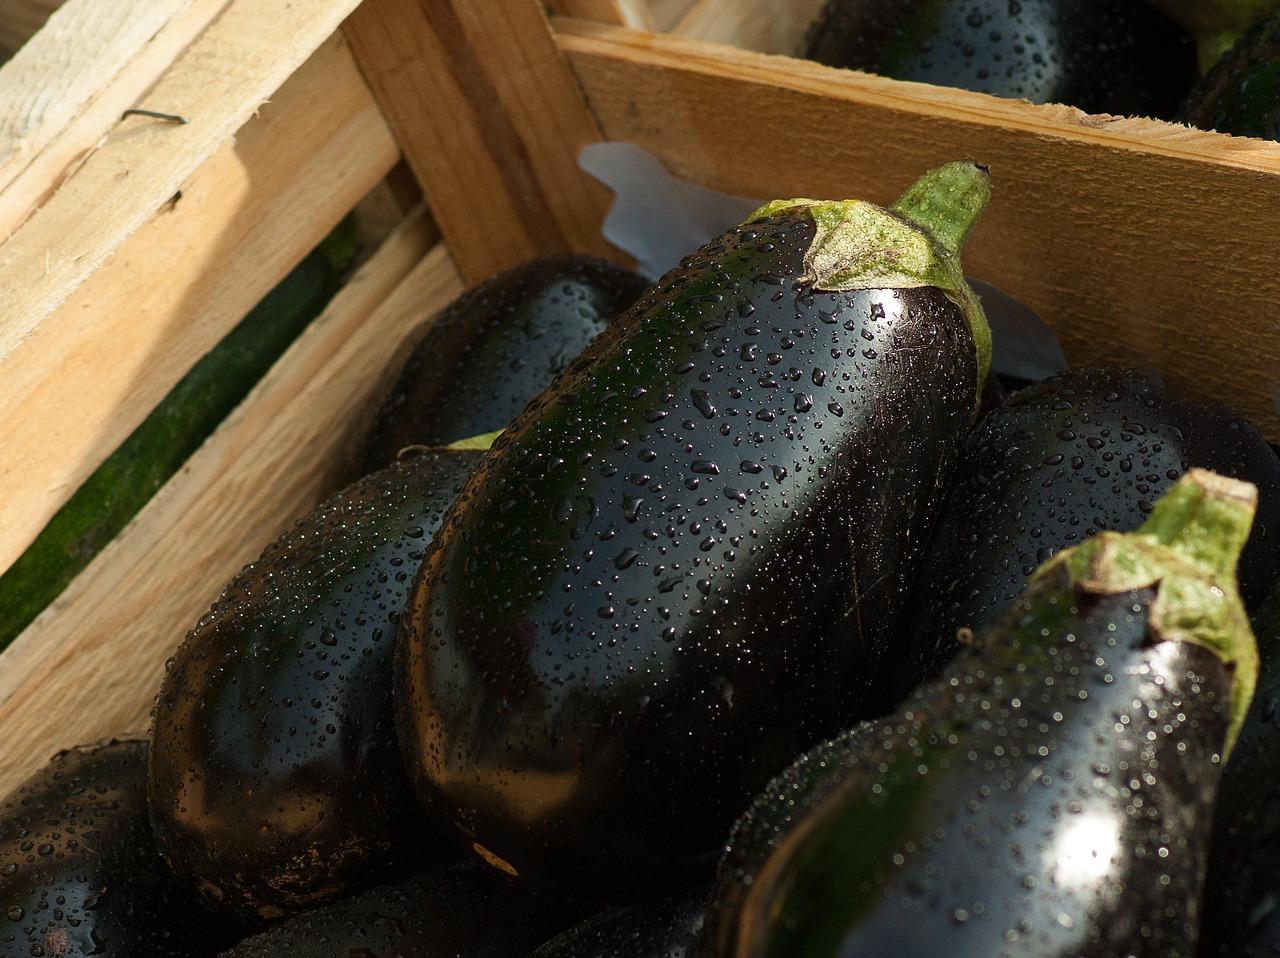 eggplant 1707629 1280 - 女がオナニーによく使う野菜ランキングTOP6